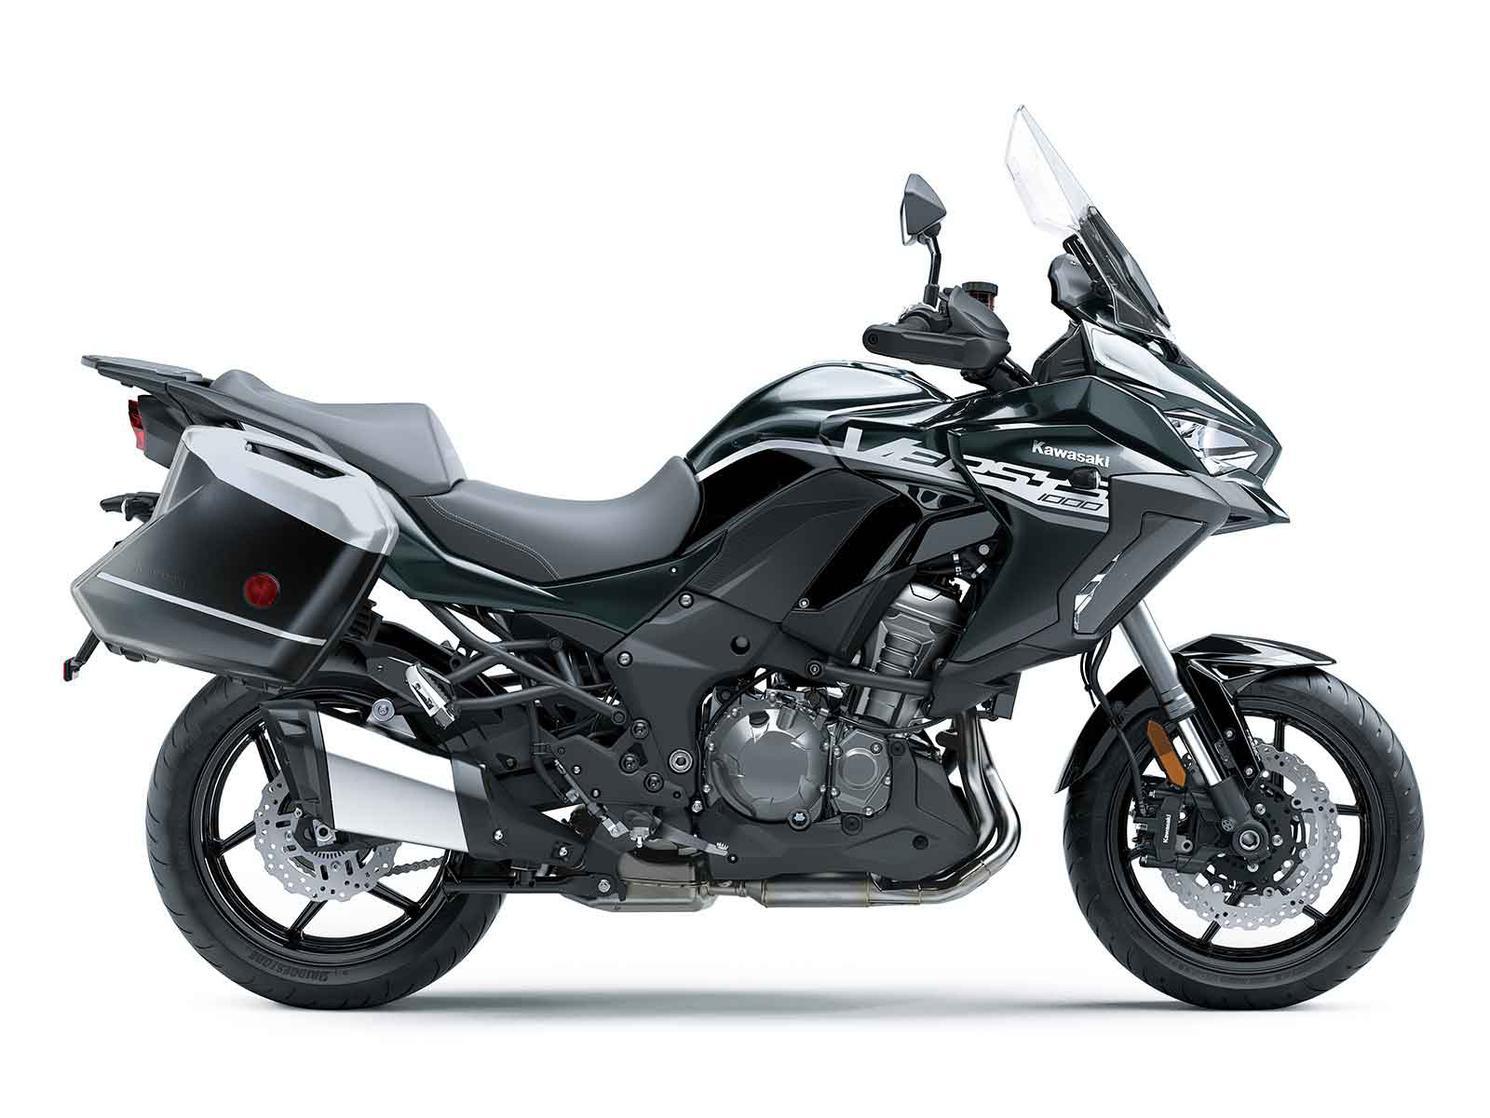 2020 Kawasaki VERSYS  1000 ABS LT SE 59$/semaine